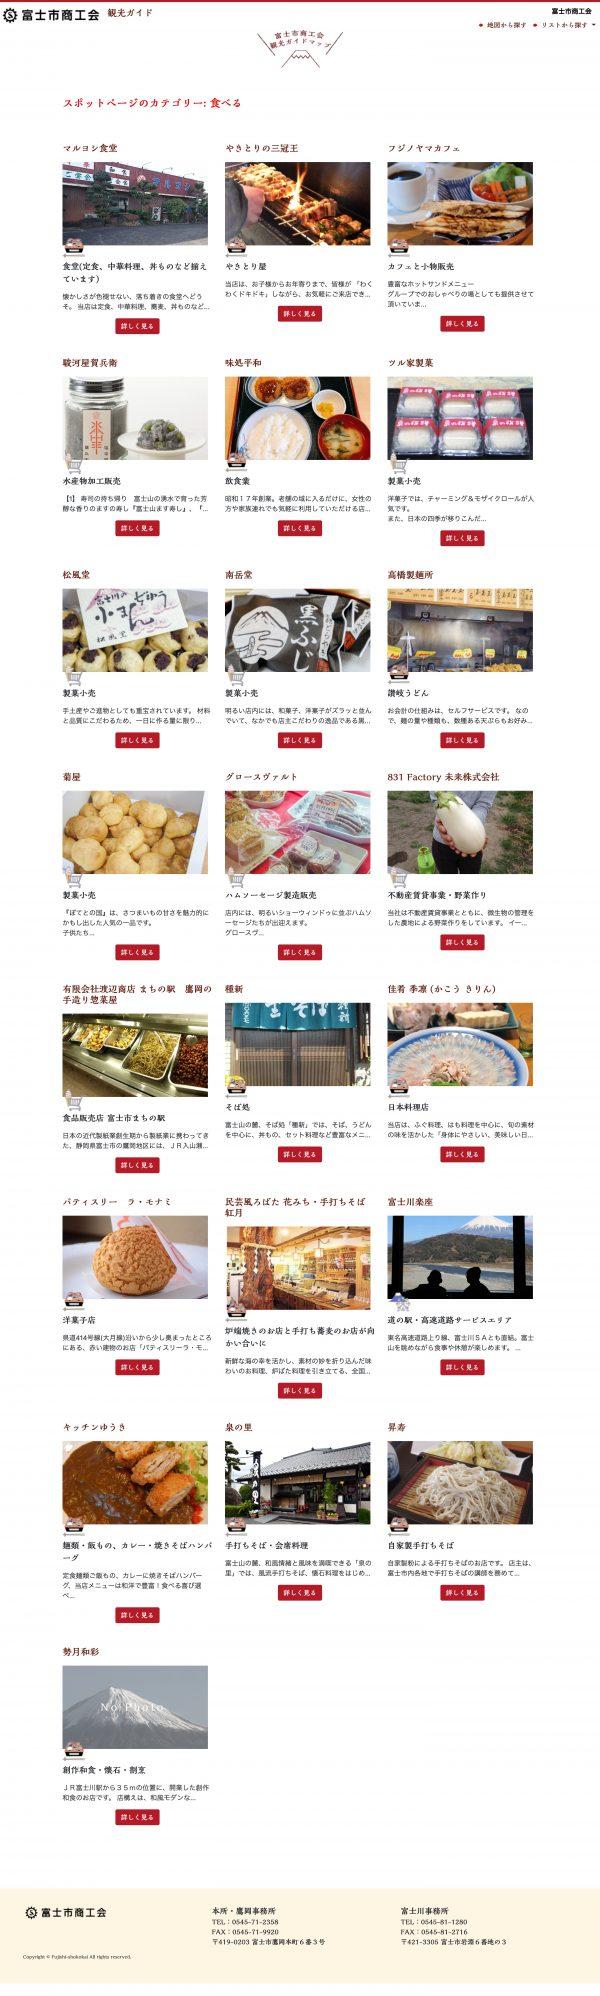 富士市商工会観光サイト